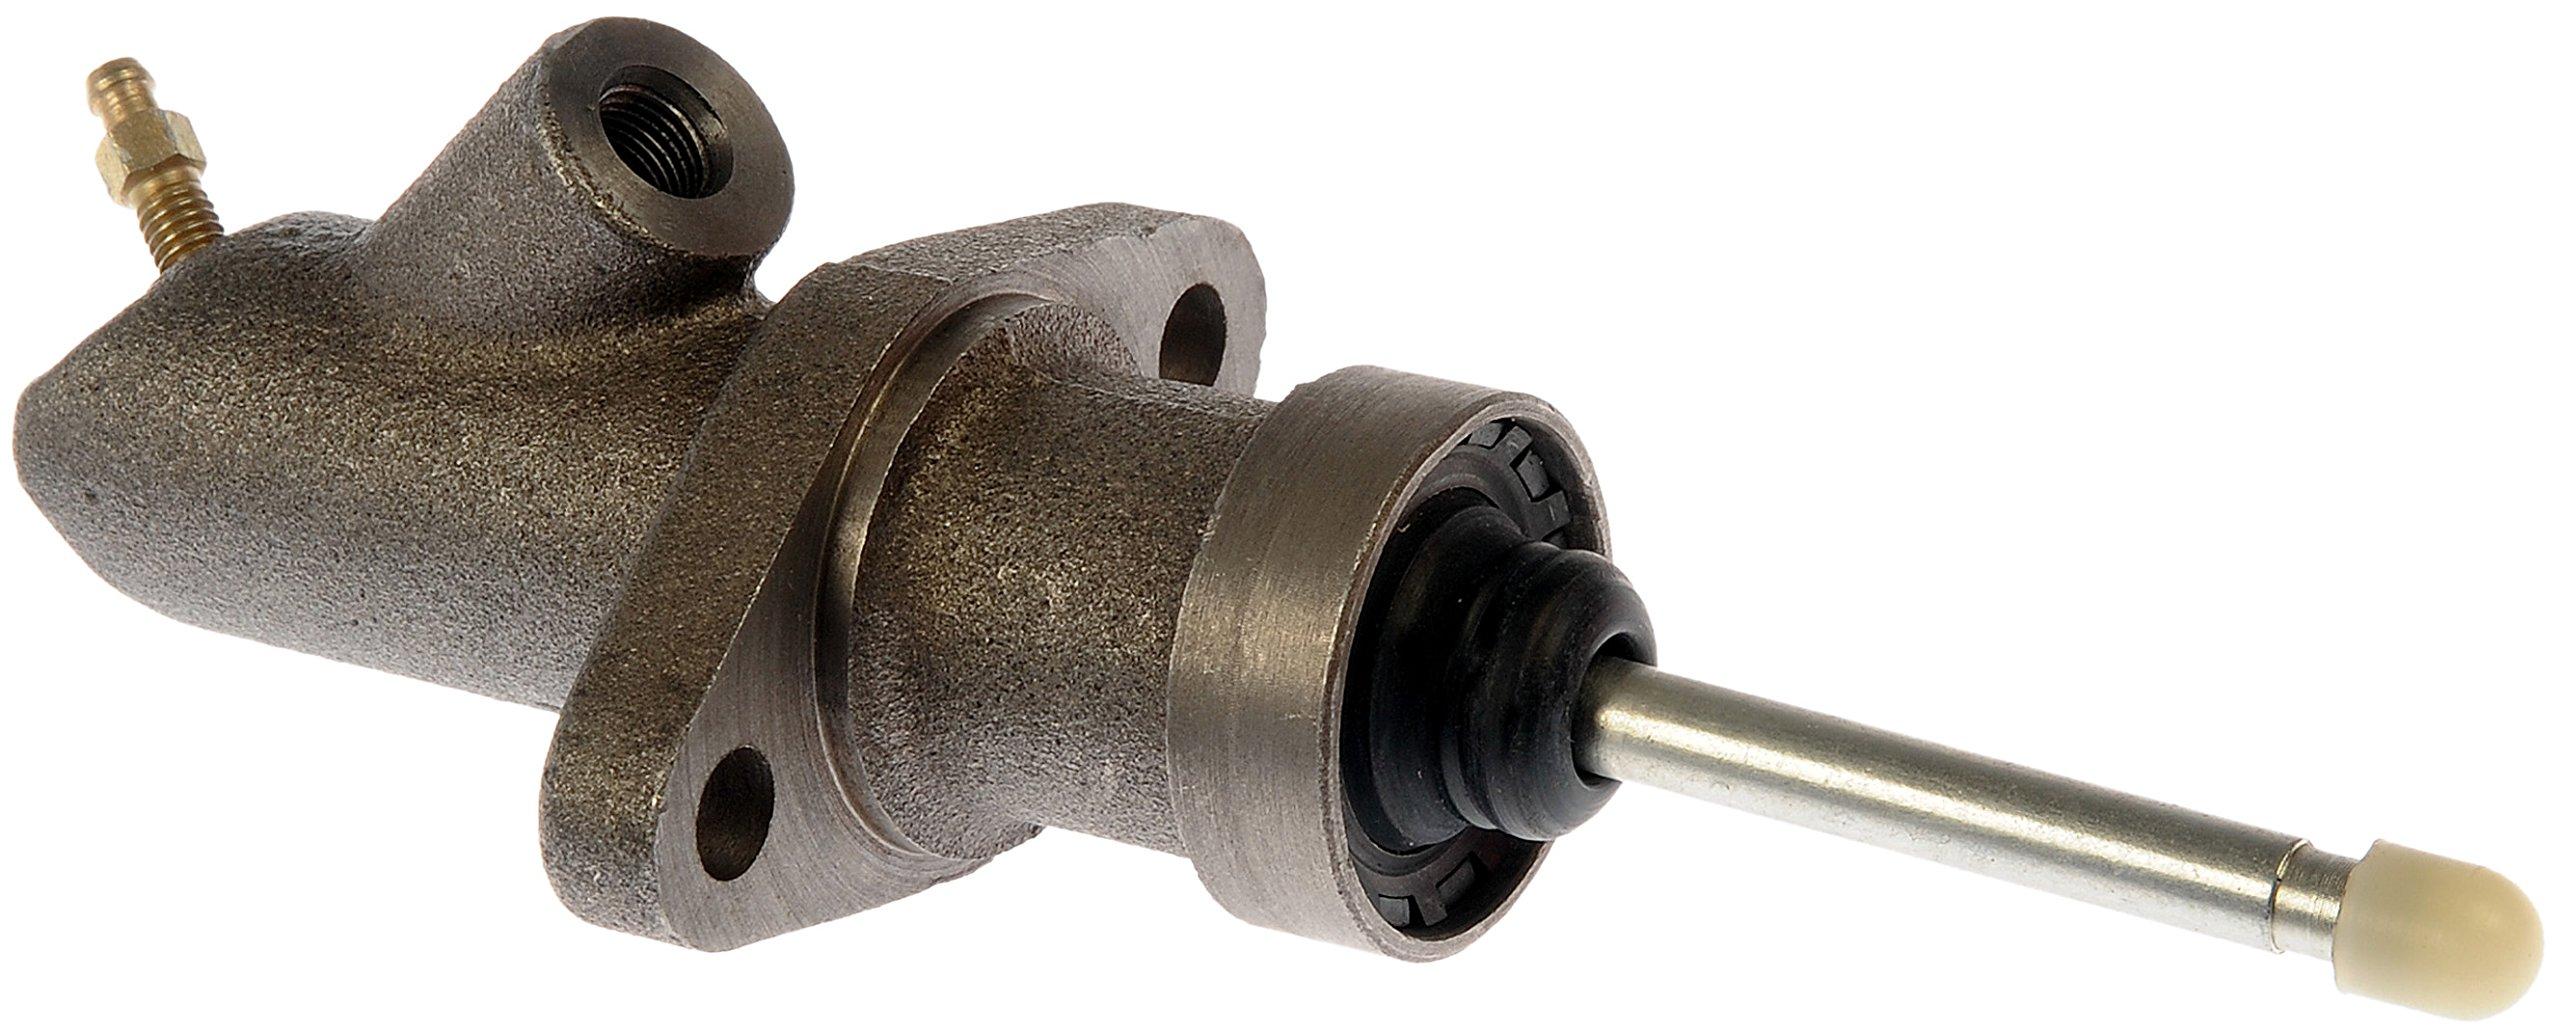 Dorman CS650013 Clutch Slave Cylinder